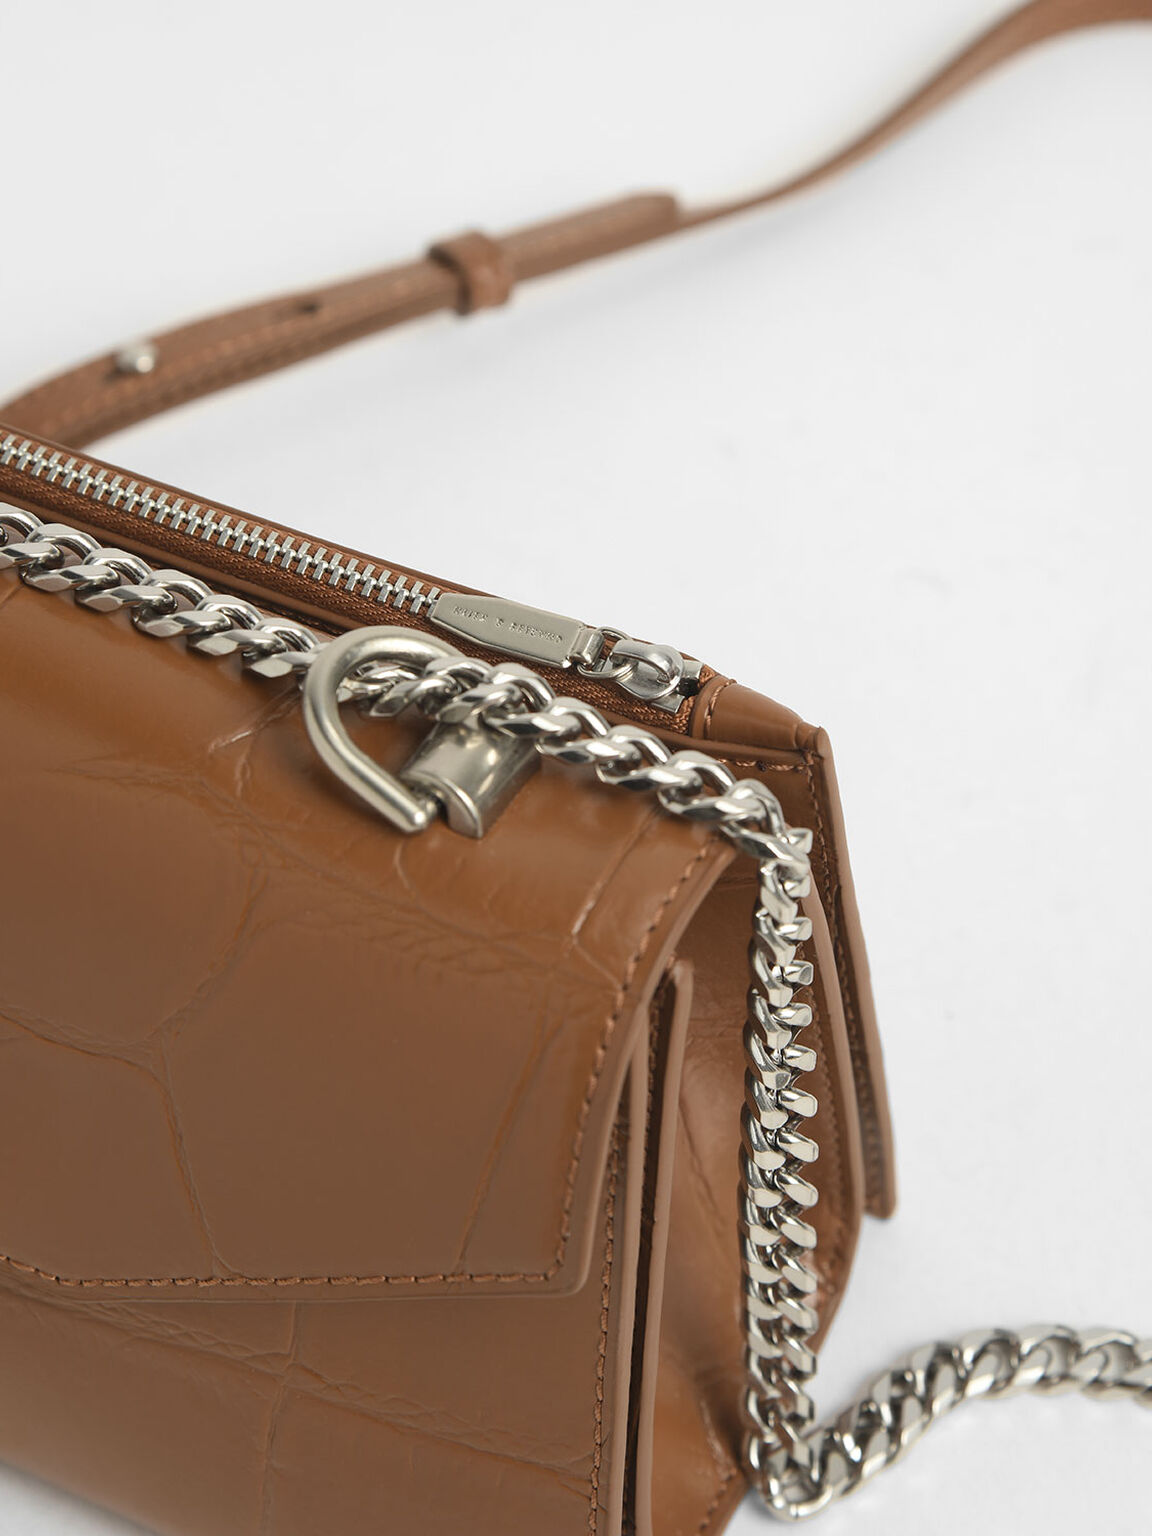 Croc-Effect Turn-Lock Crossbody Bag, Cognac, hi-res